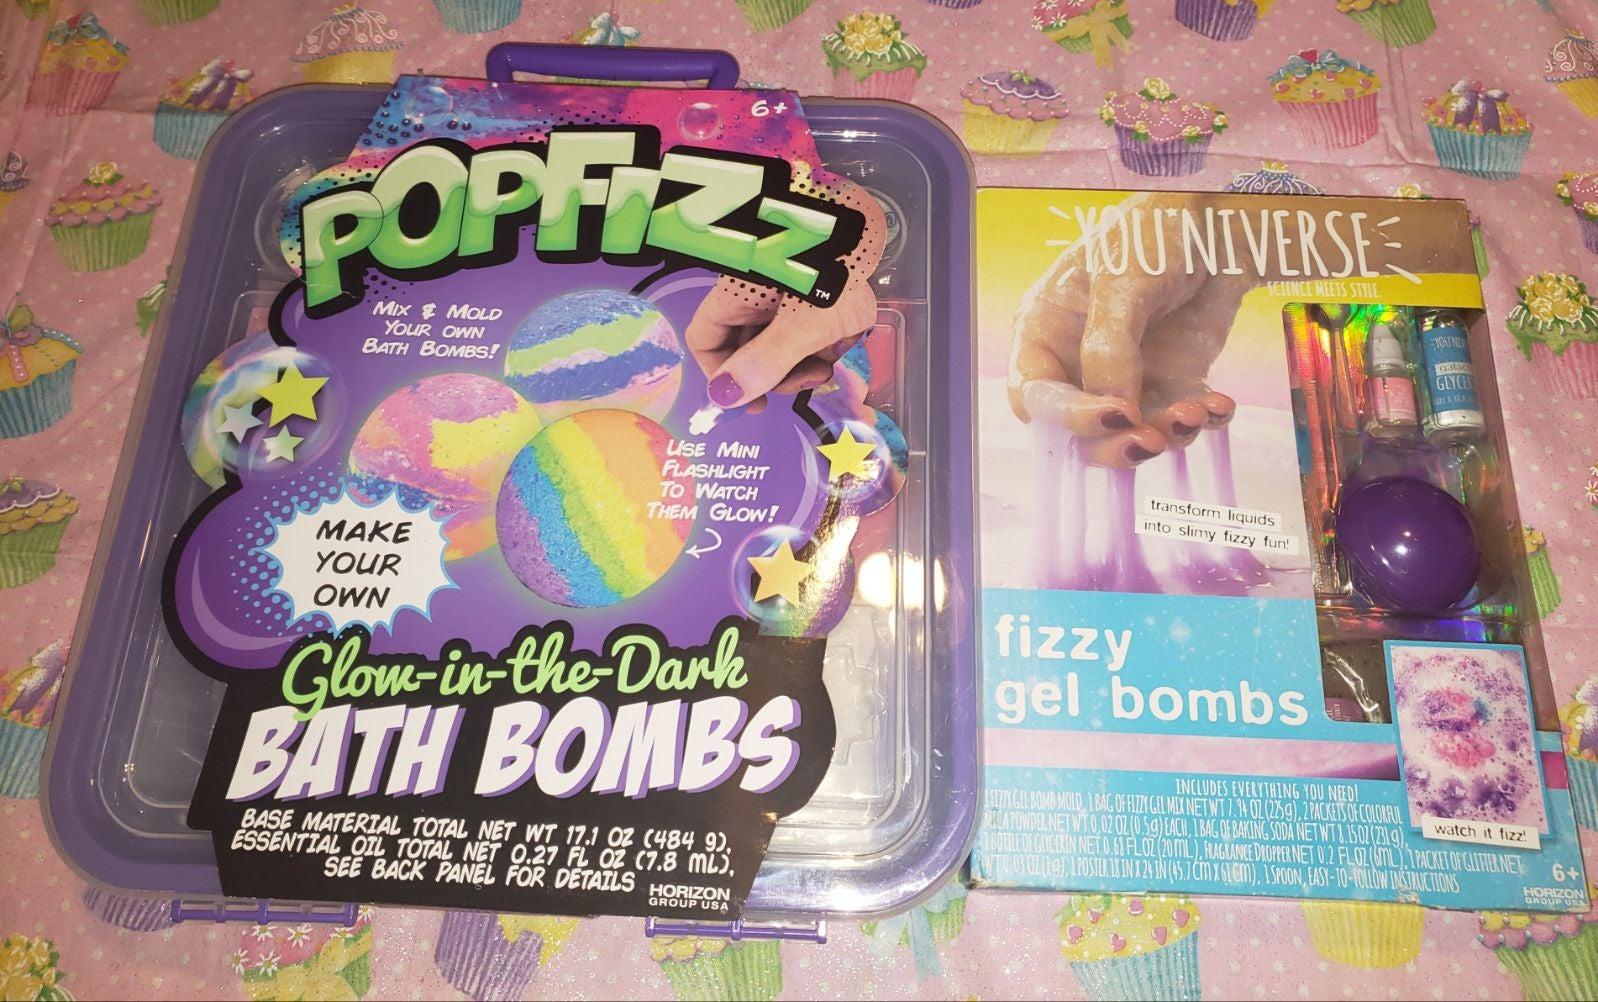 PopFizz & You*Niverse Bath Bombs